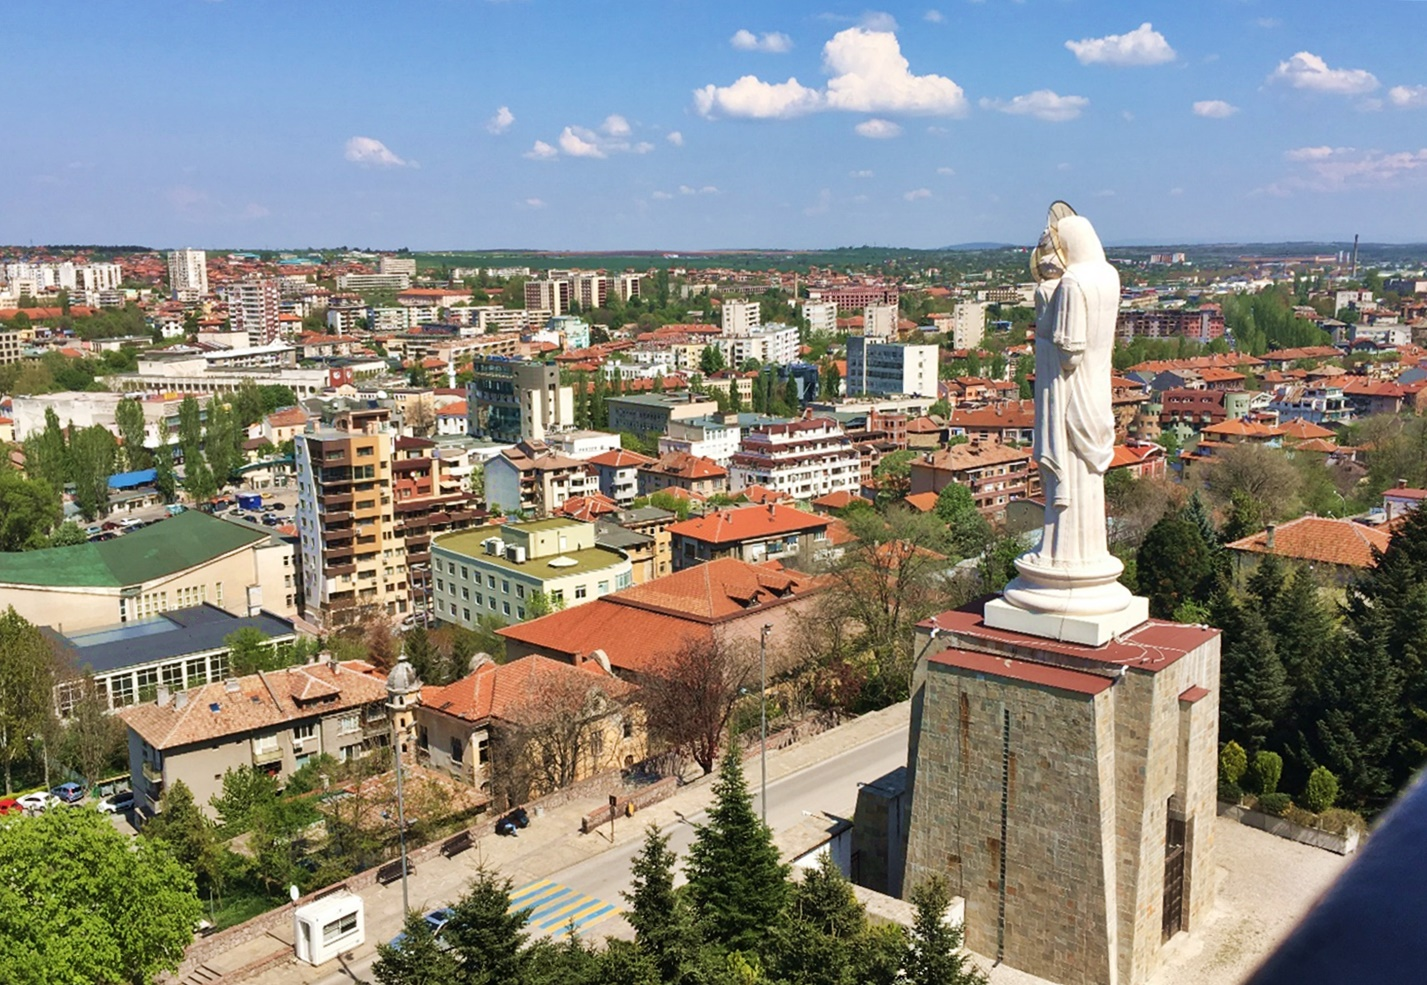 Holy Virgin Mary statue haskovo bulgaria